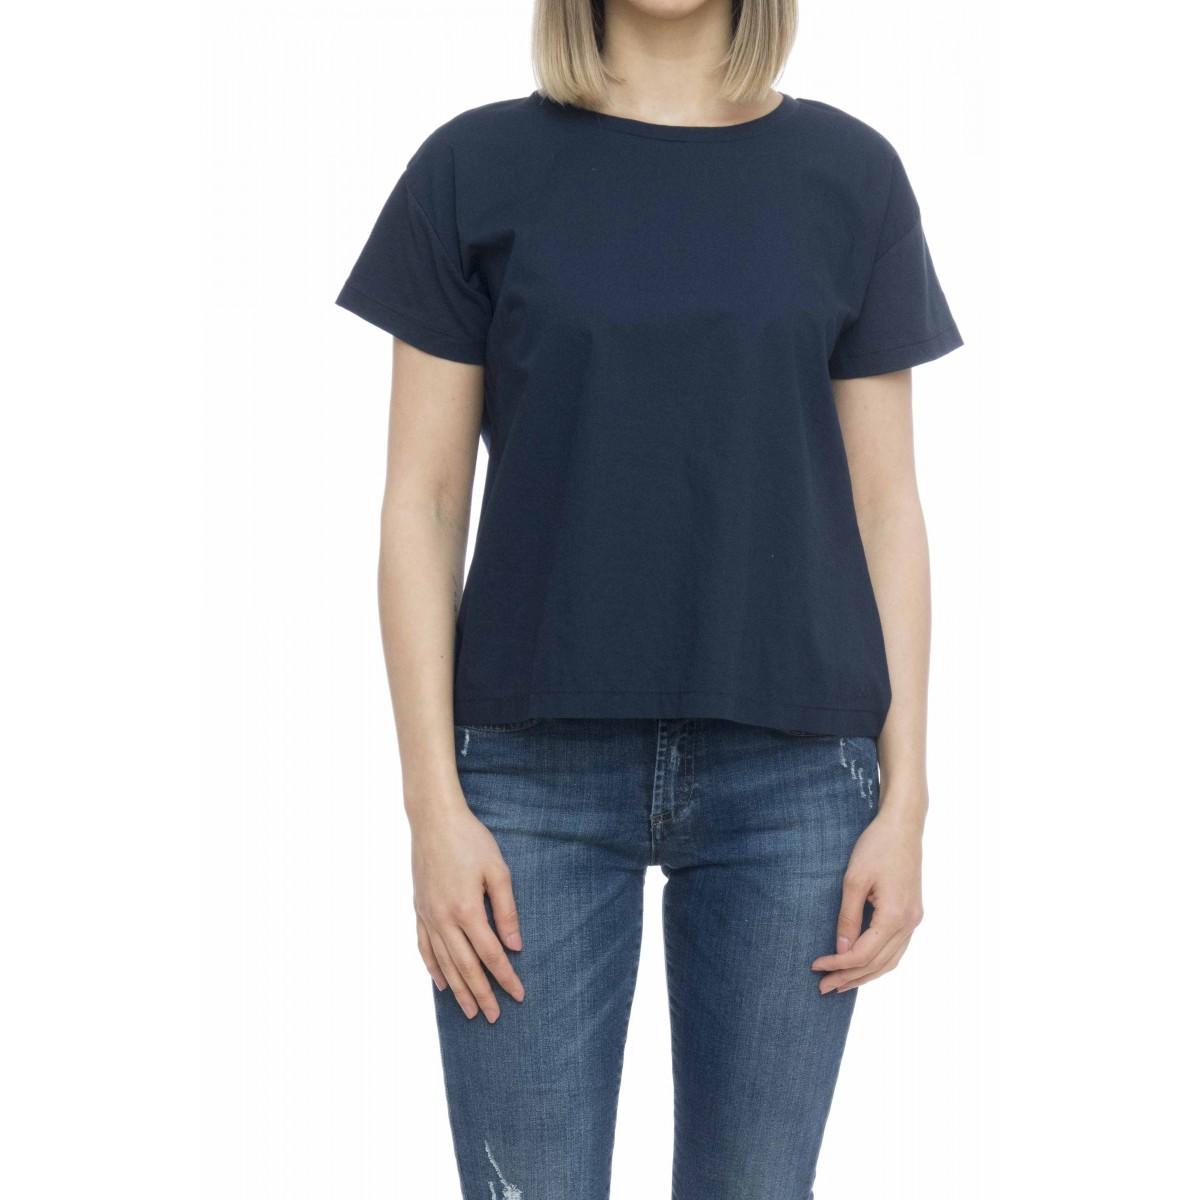 T-shirt donna - T19215 t-shirt tela + maglina